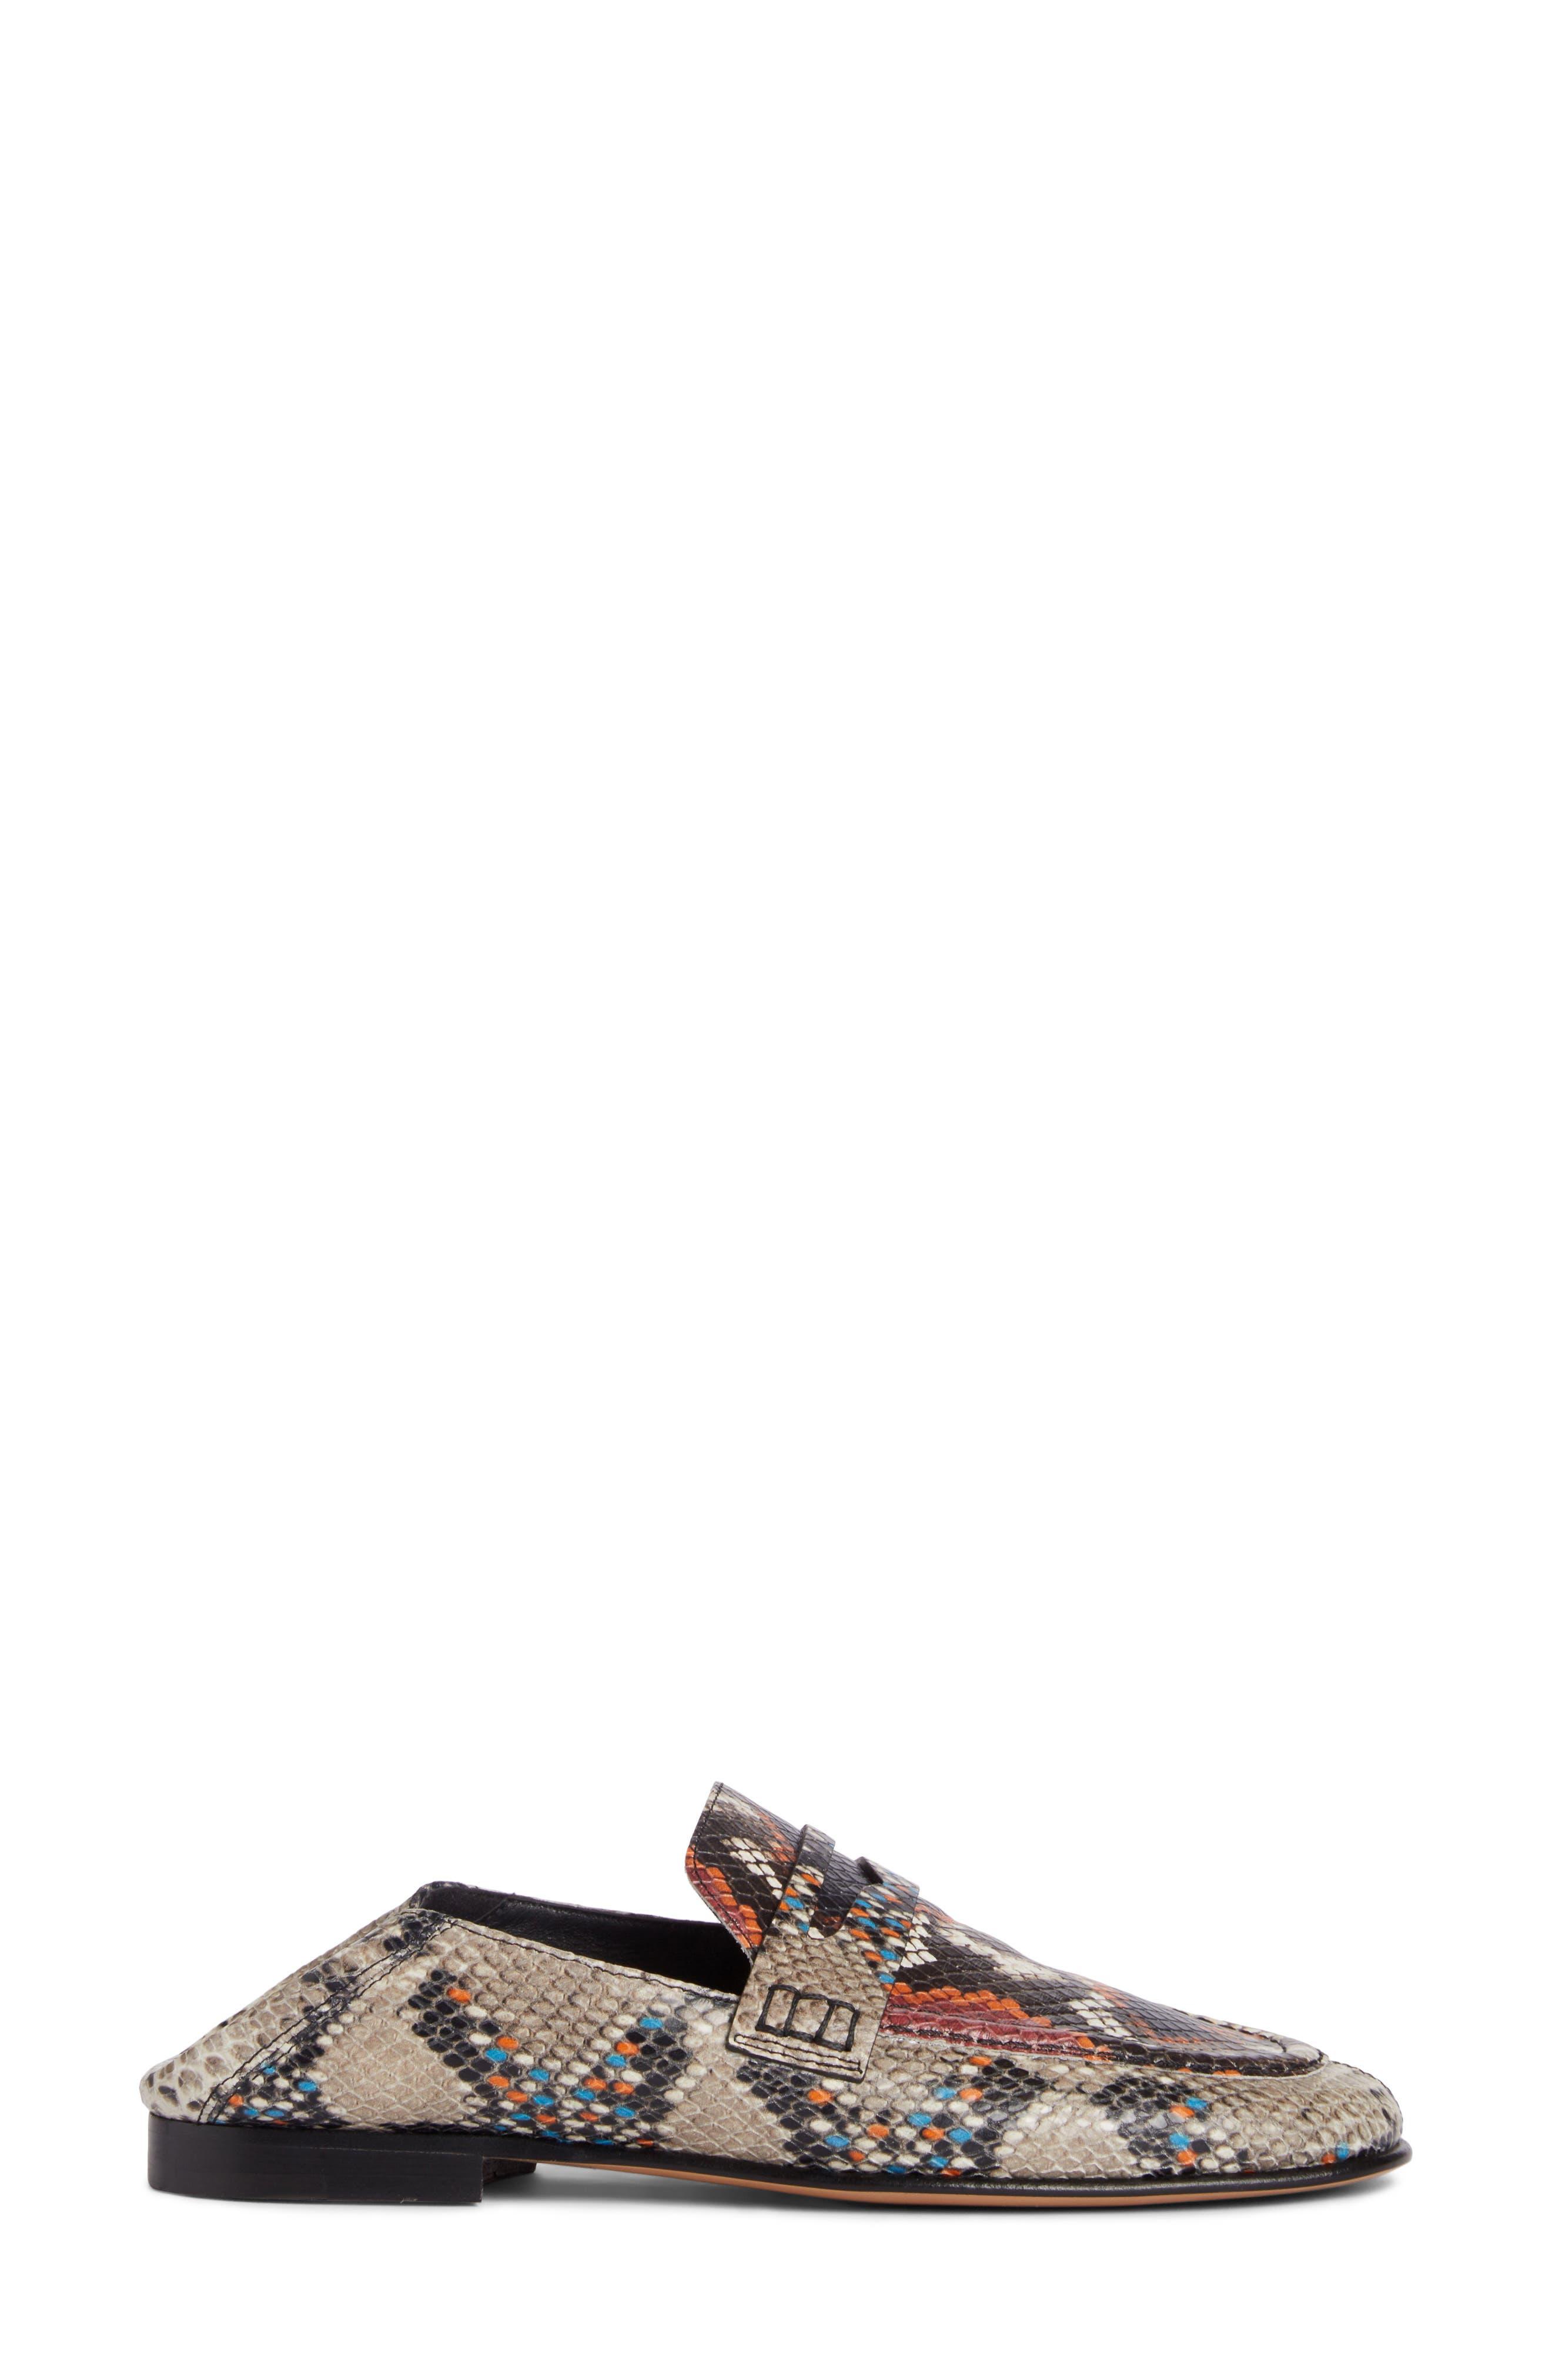 Fezzy Snakeskin Embossed Convertible Loafer,                             Alternate thumbnail 3, color,